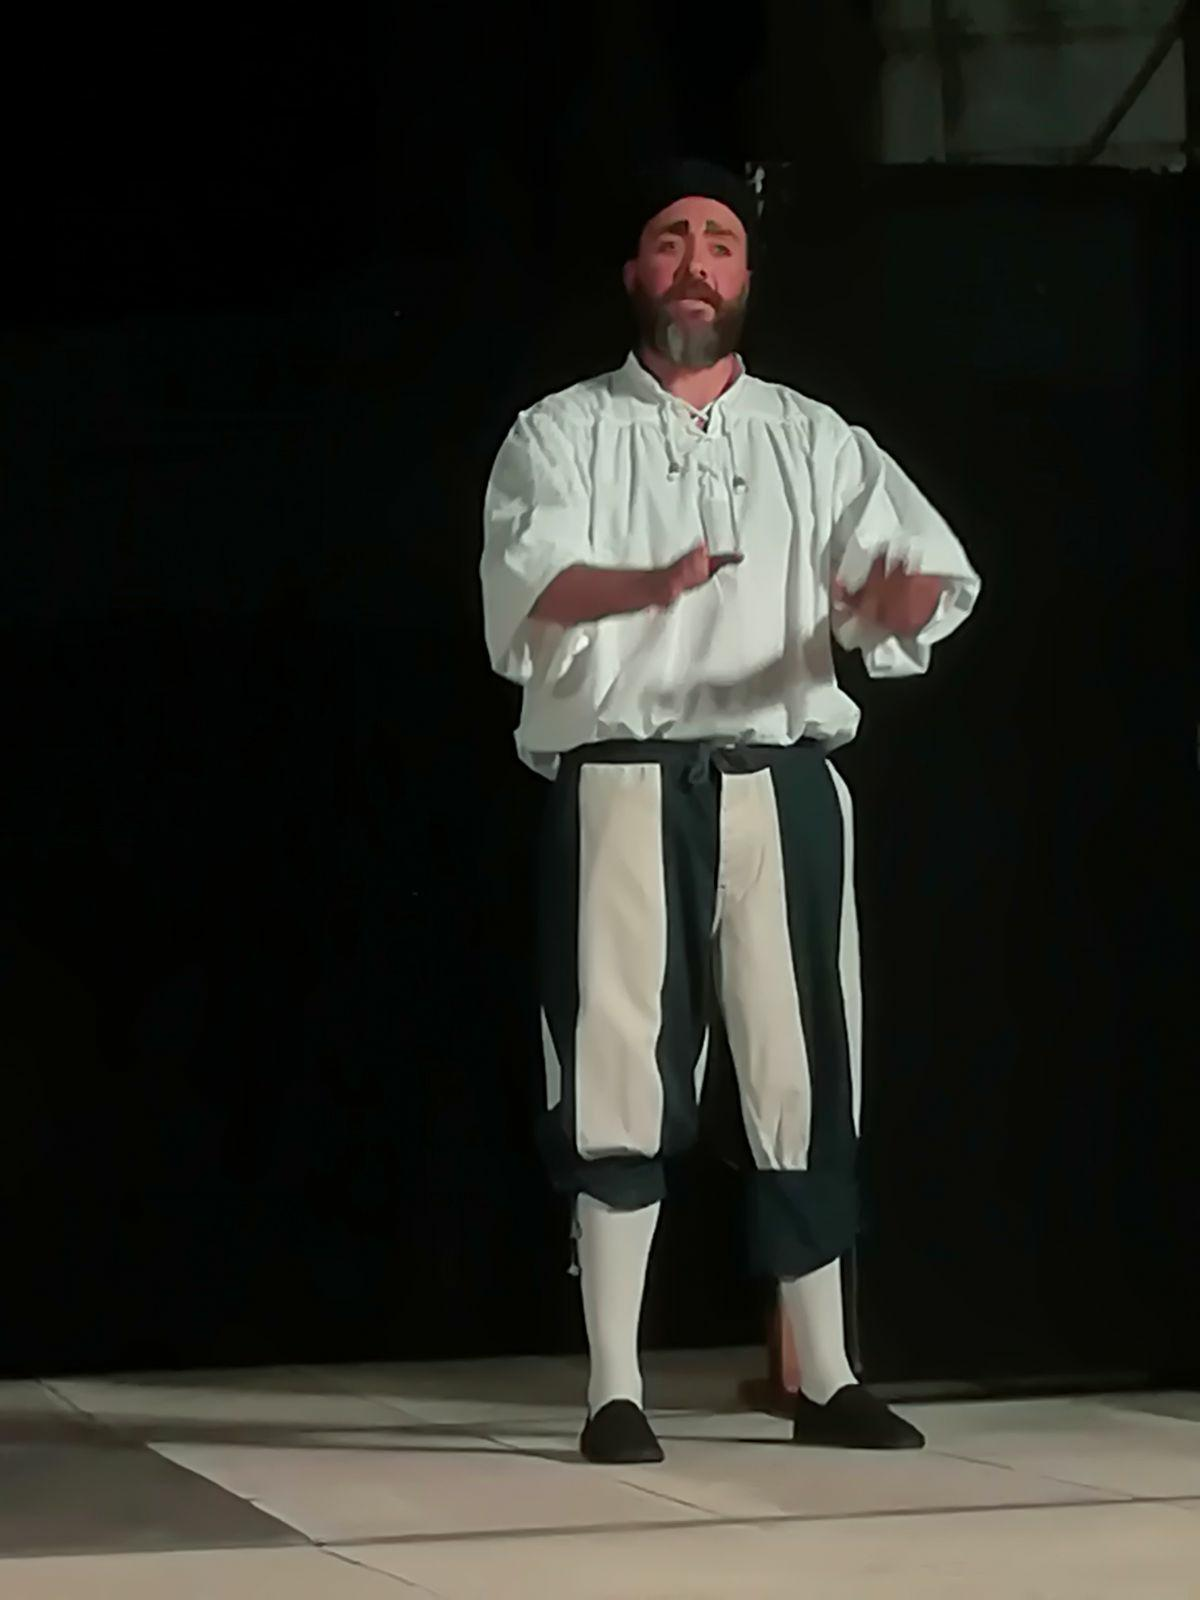 La farsa del maestro Pathelin